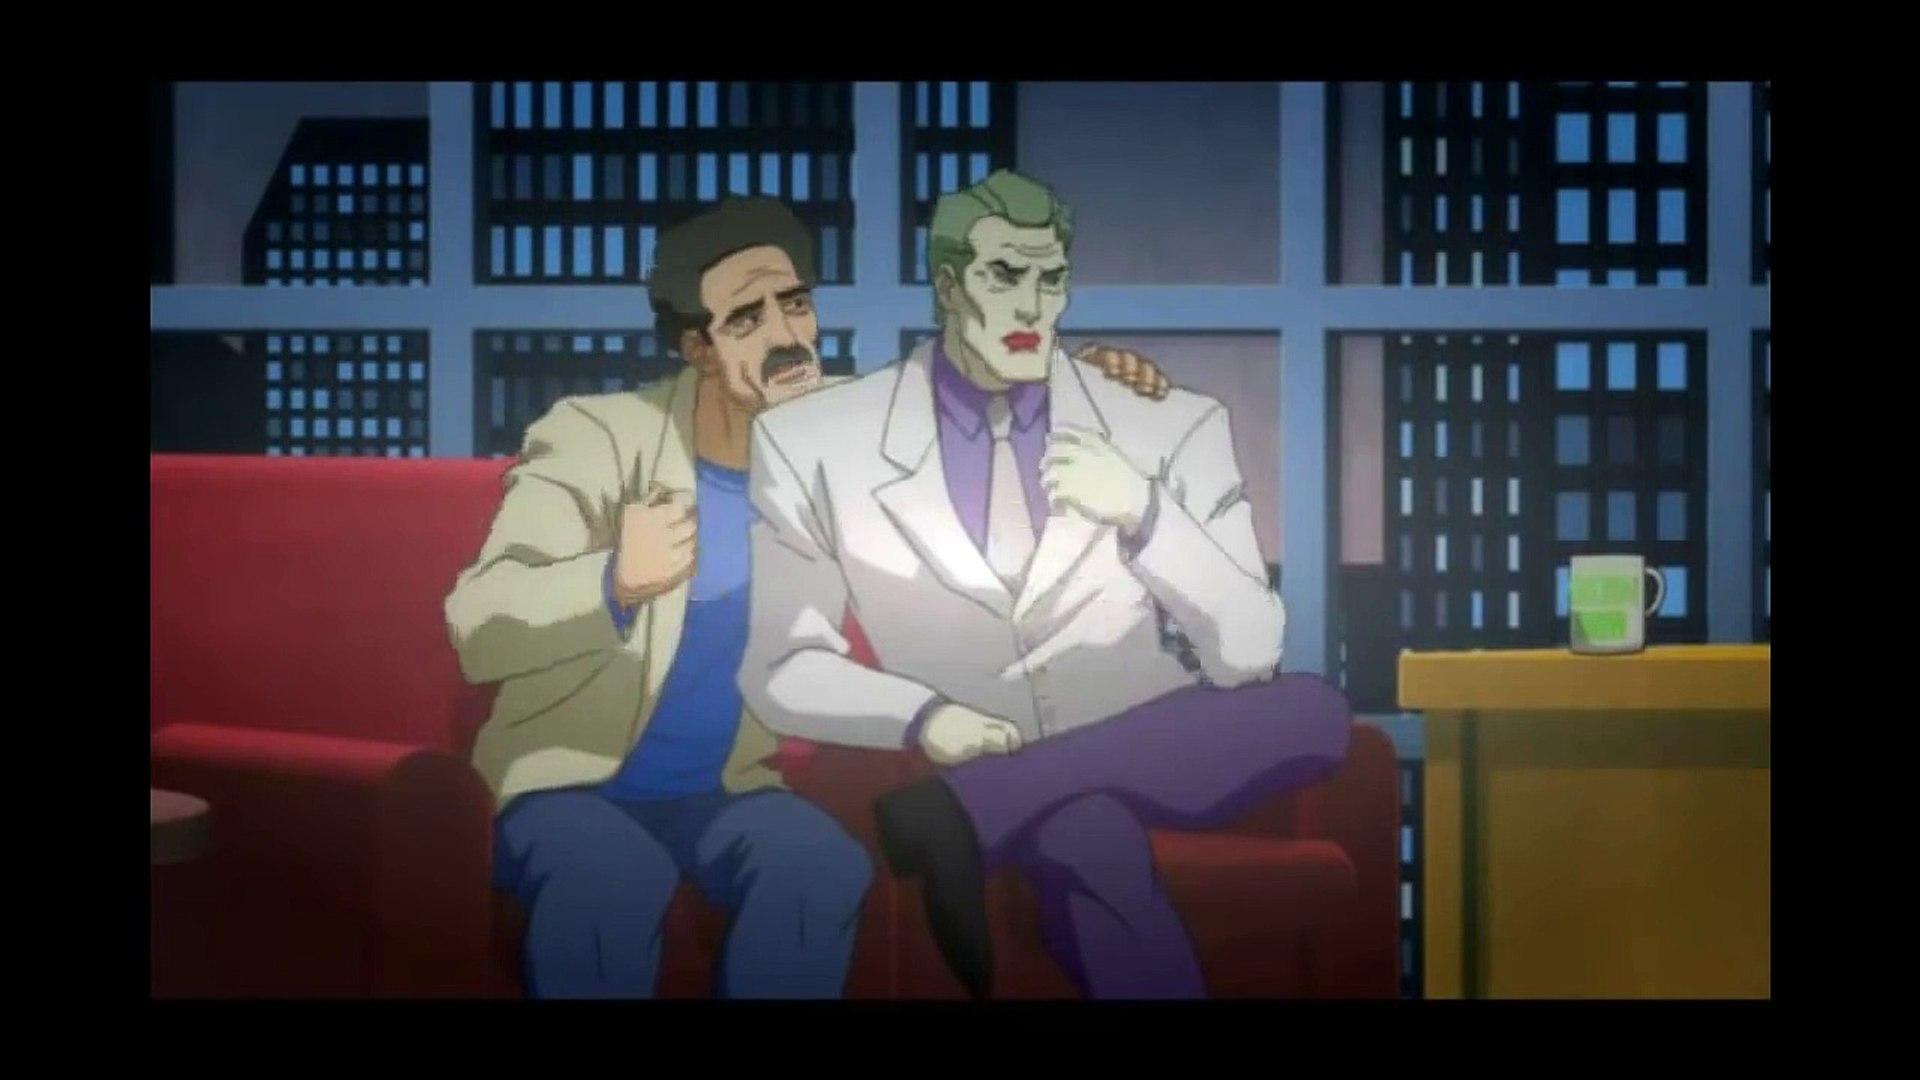 Batman Français [A-N-M] D.e.s.s.i.n [A-N-M]e vidéo D.e.s.s.i.n [A-n-i-m-a-t-i-o-n-s])]